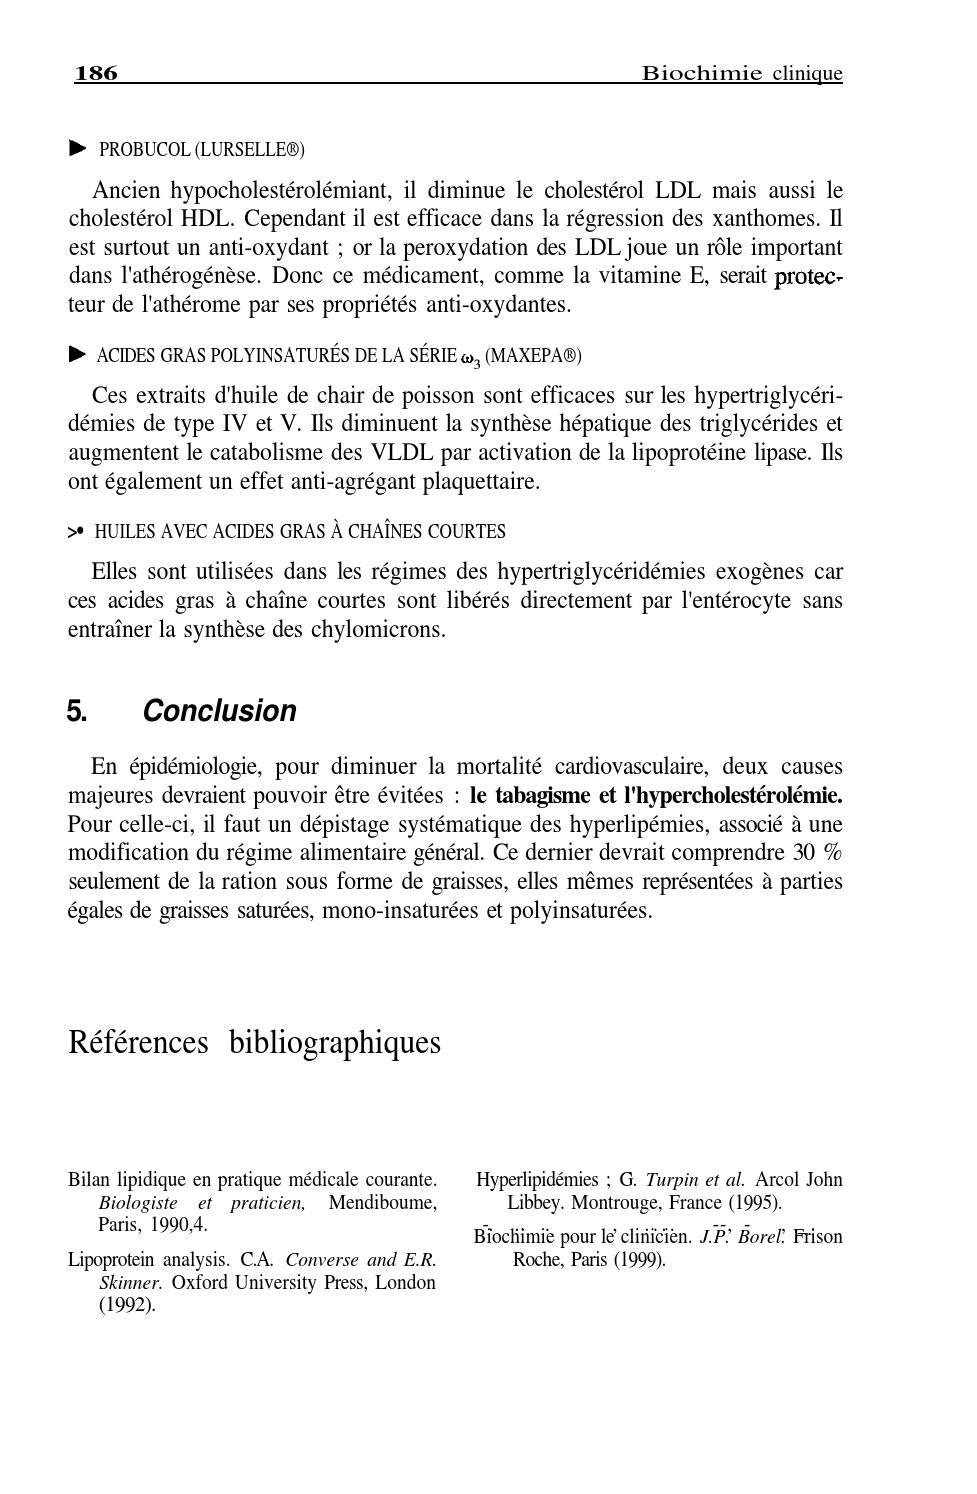 Biochimie clinique by Ahmed Bénchir - issuu